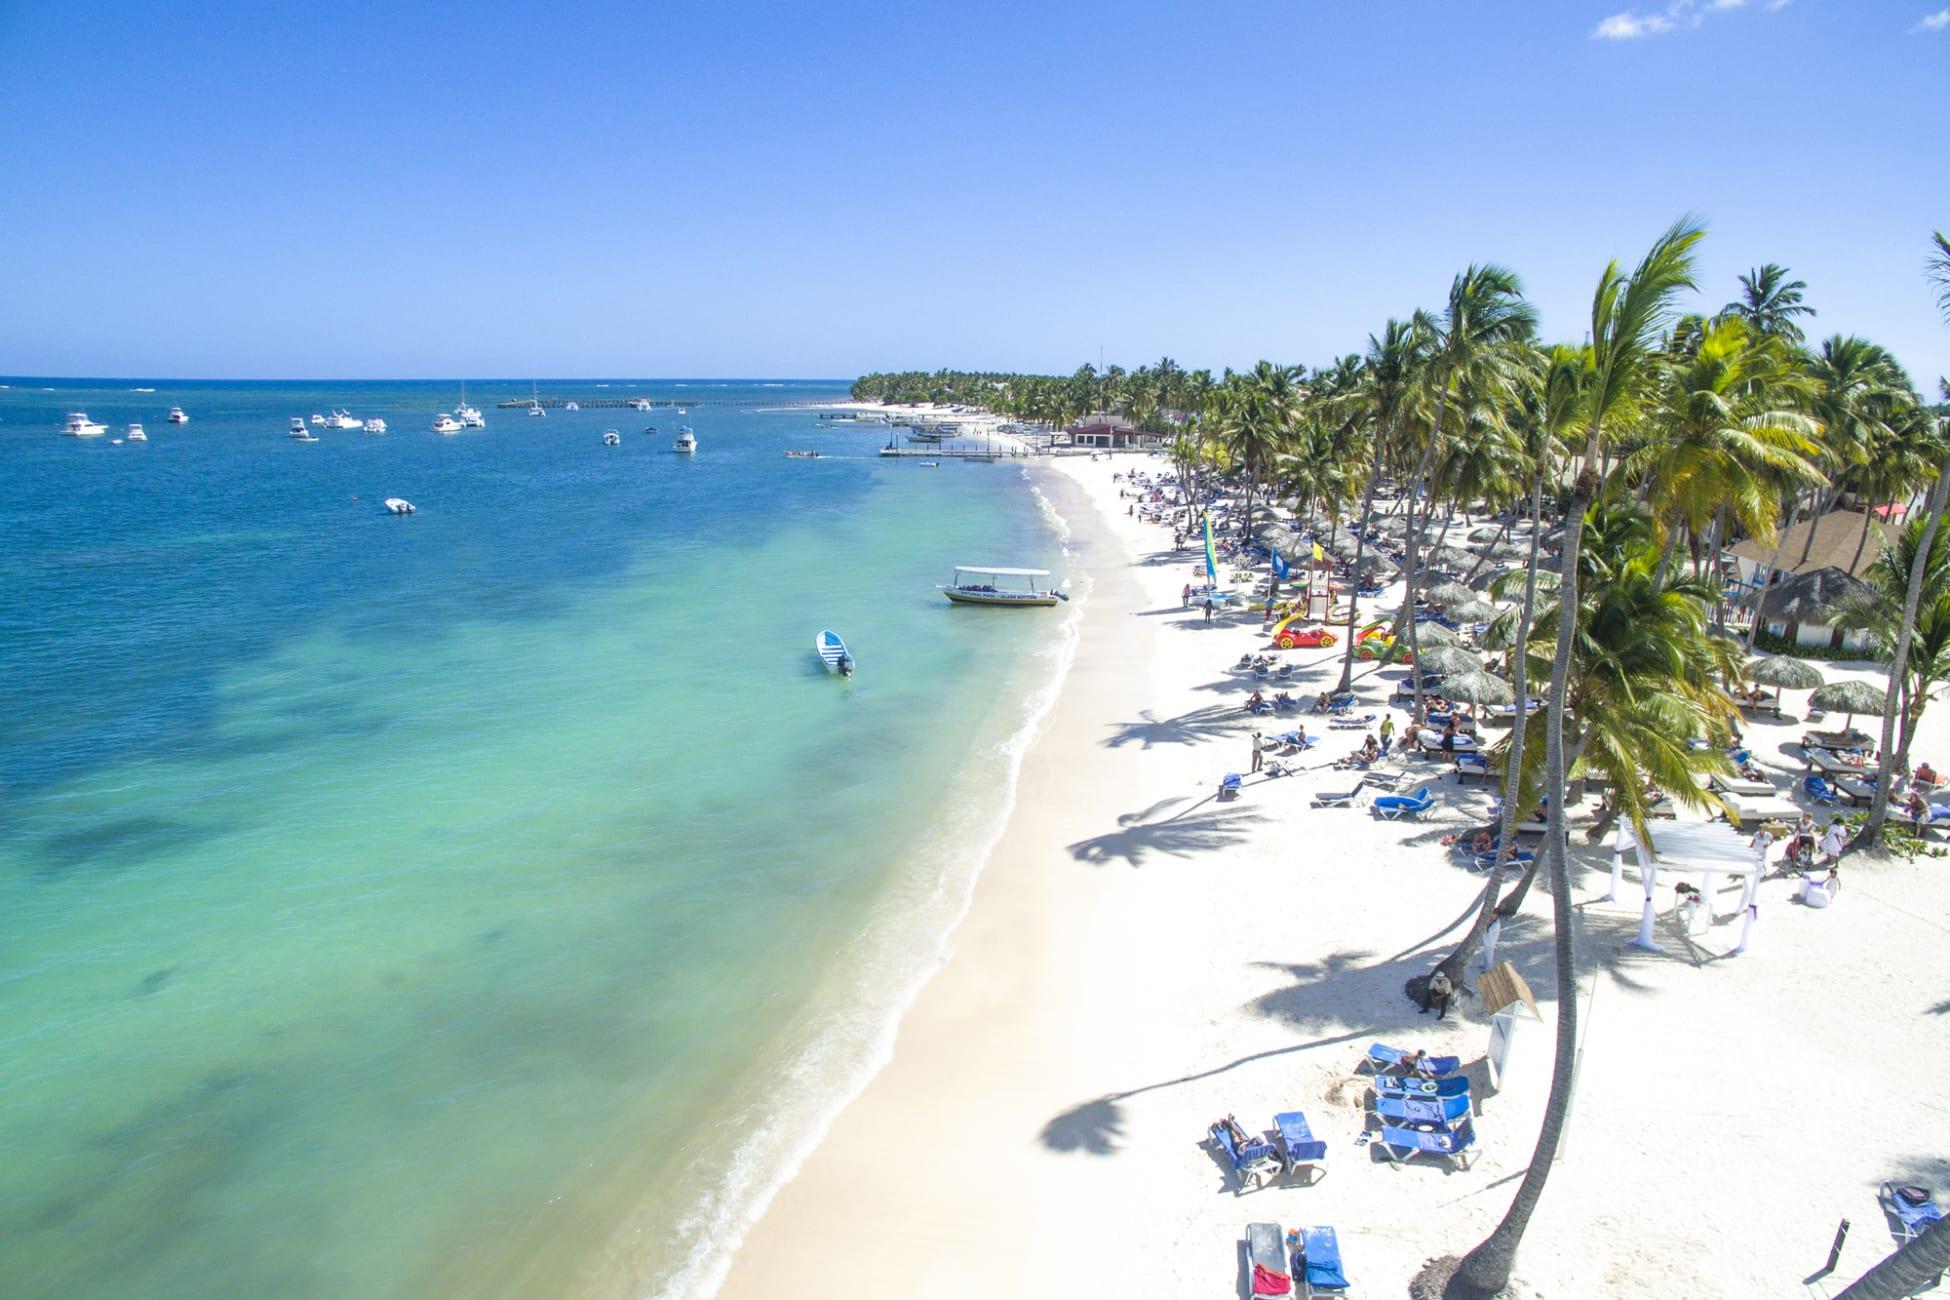 Стала известна дата открытия отеля Be Live Collection Punta Cana